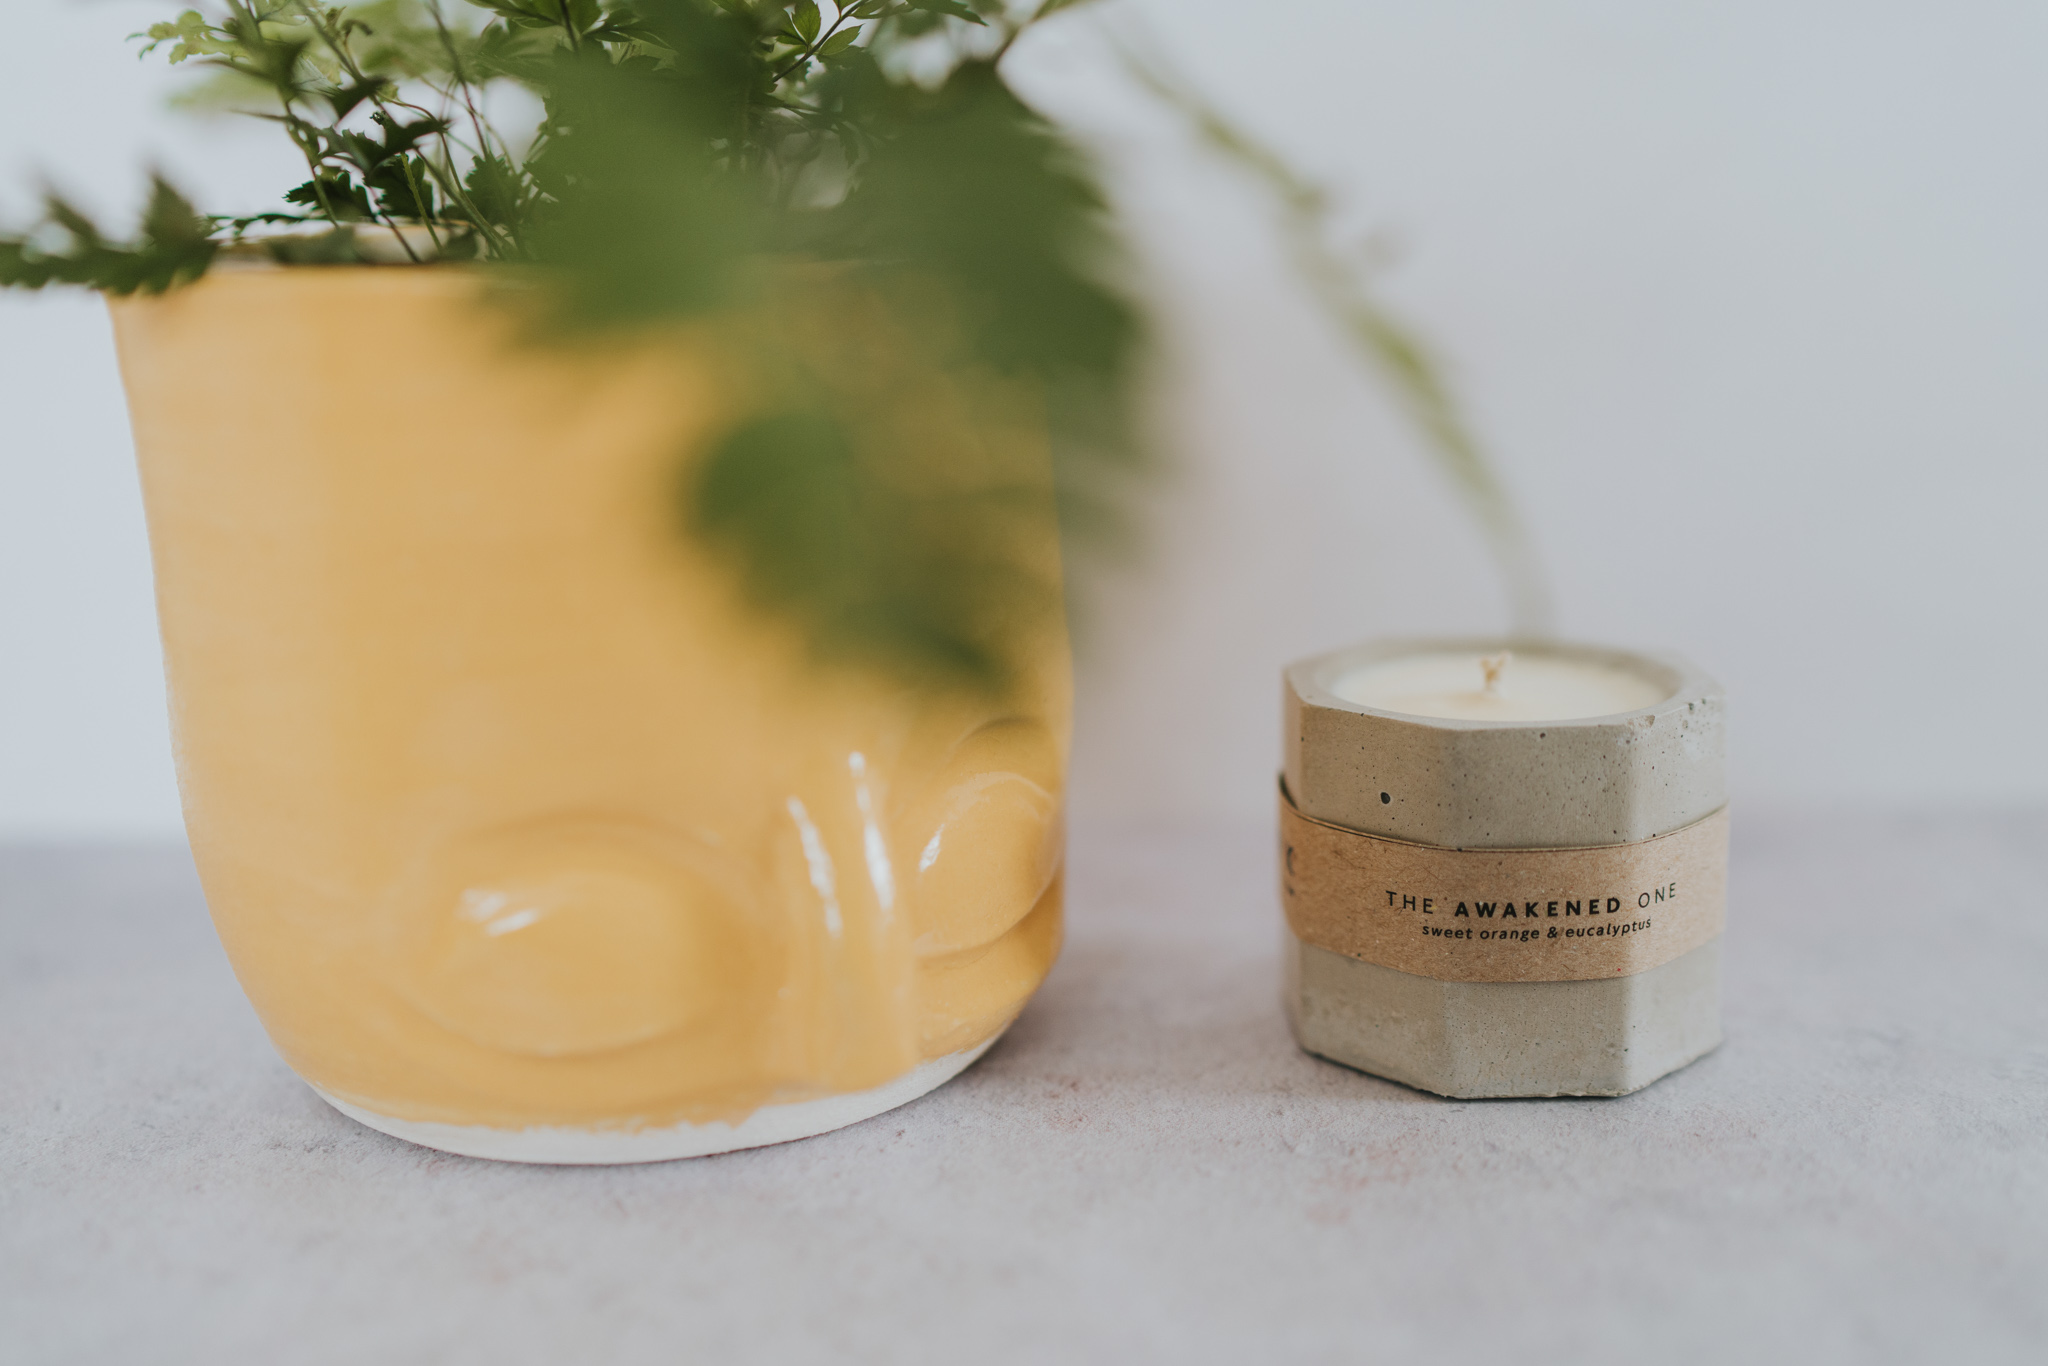 business-branding-panpank-candles-grace-elizabeth-colchester-essex-devon-suffolk-and-norfolk-alternative-wedding-and-family-photographer (4 of 19).jpg